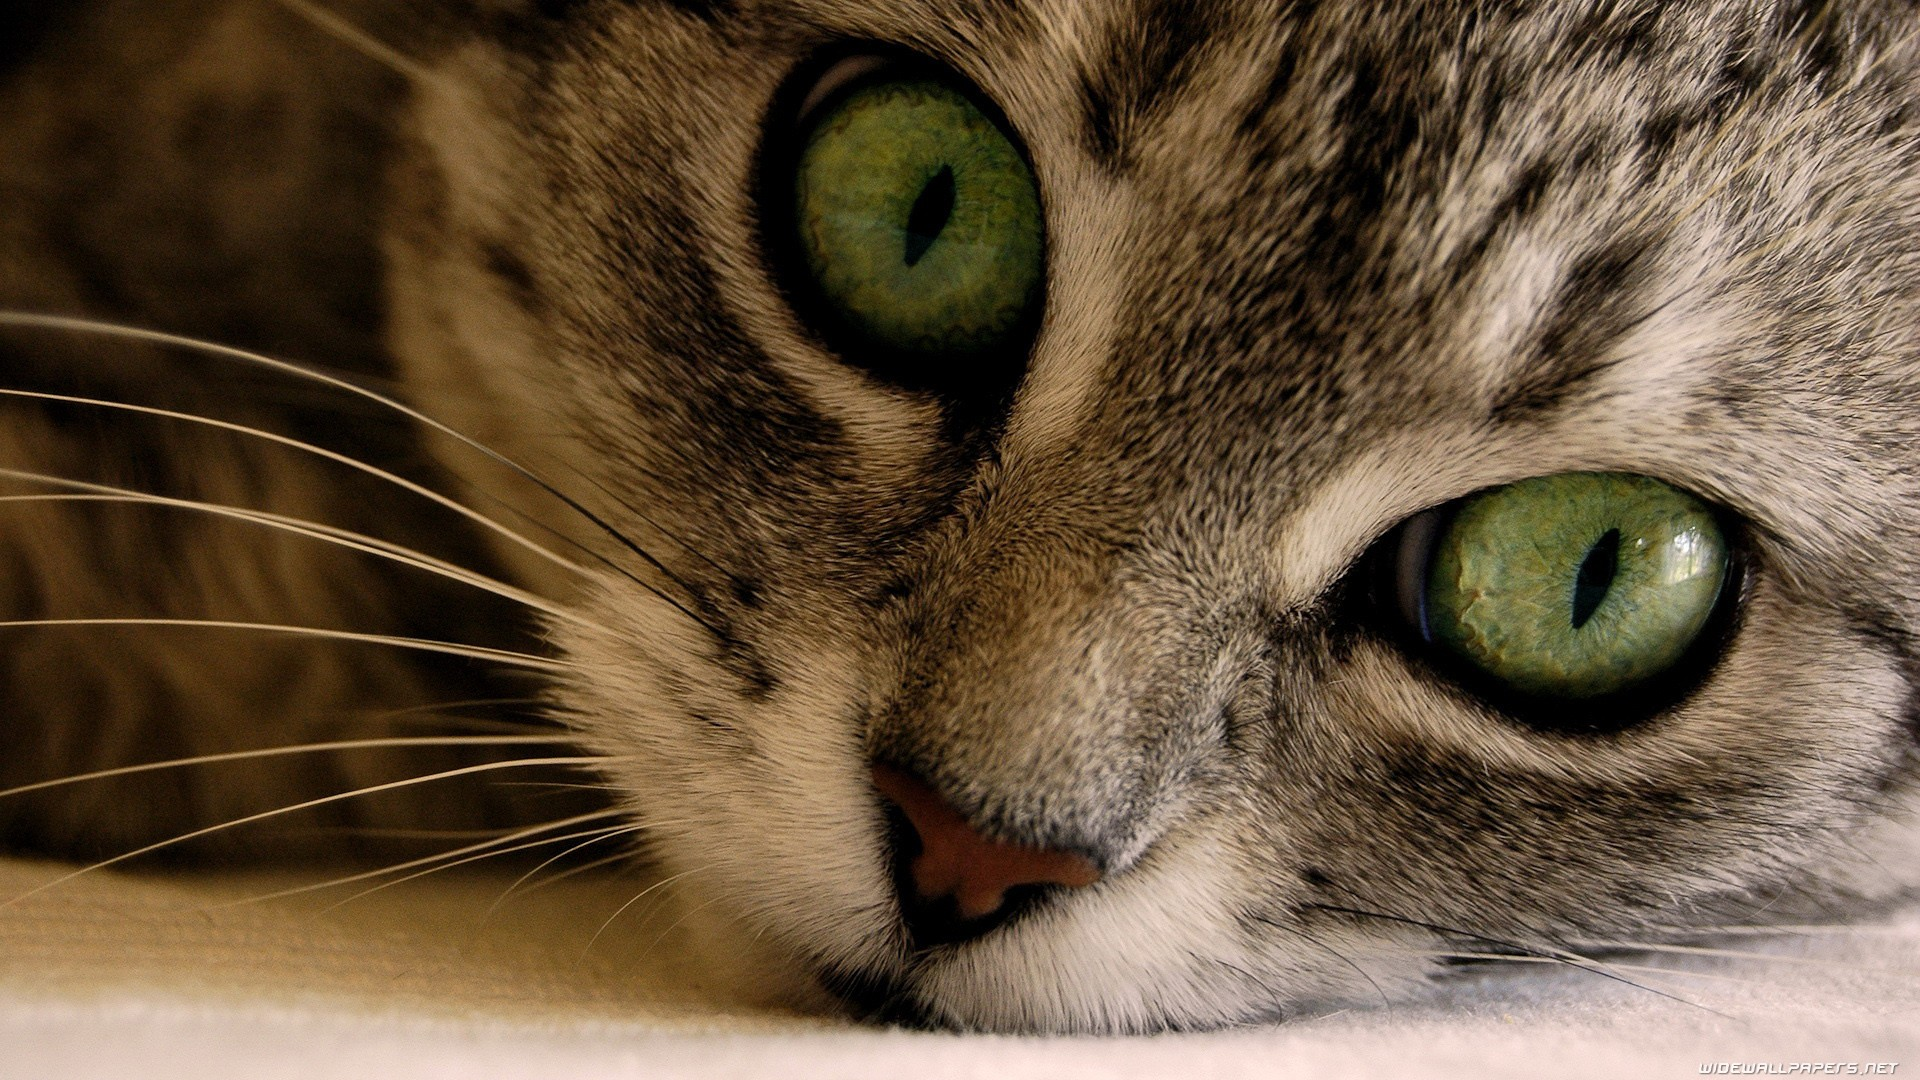 Eyes Cats Wallpaper 1920x1080 Eyes Cats Animals Green Eyes 1920x1080